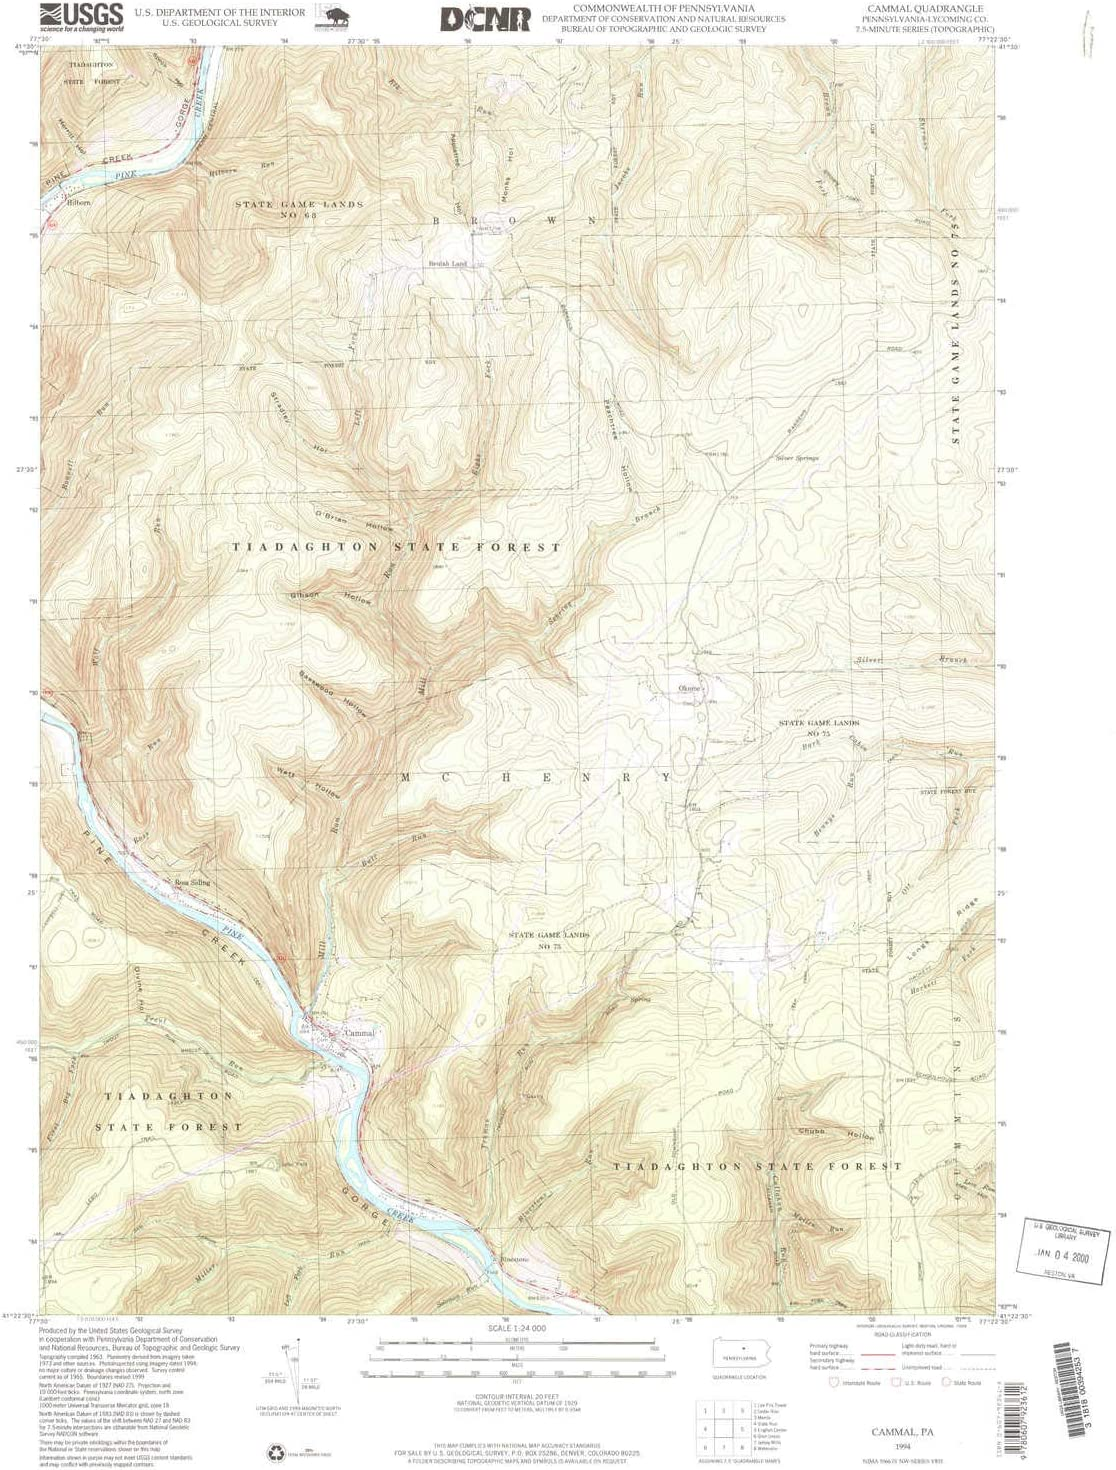 YellowMaps セール特価 Cammal PA topo 祝日 map 7.5 X 1:24000 Minute Scale